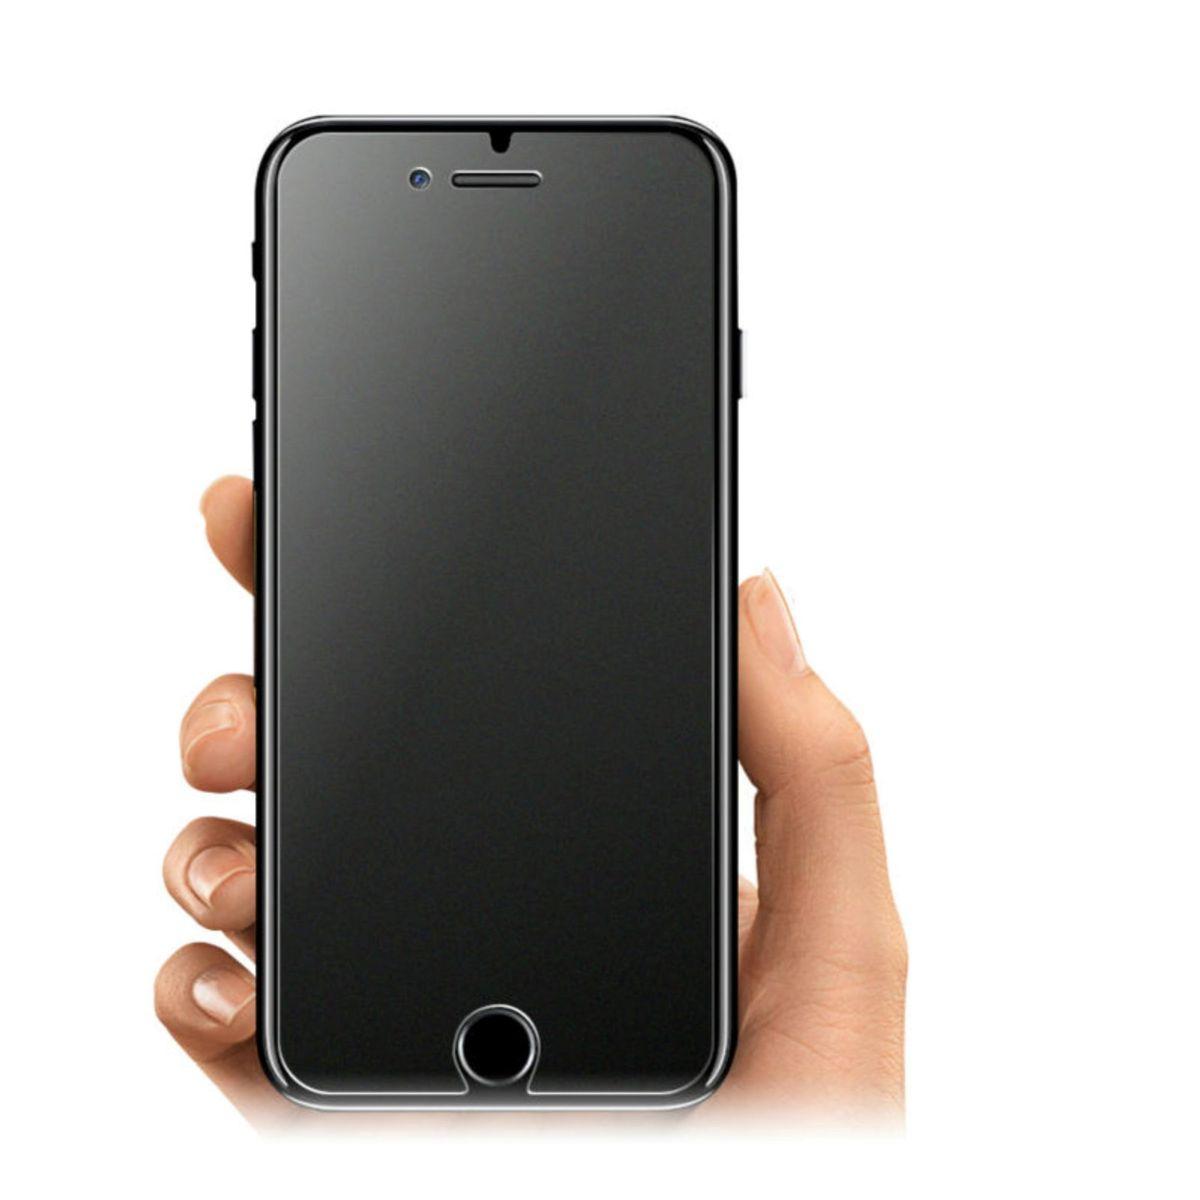 panzer schutz glas apple iphone 8 schutz folie handy matt. Black Bedroom Furniture Sets. Home Design Ideas